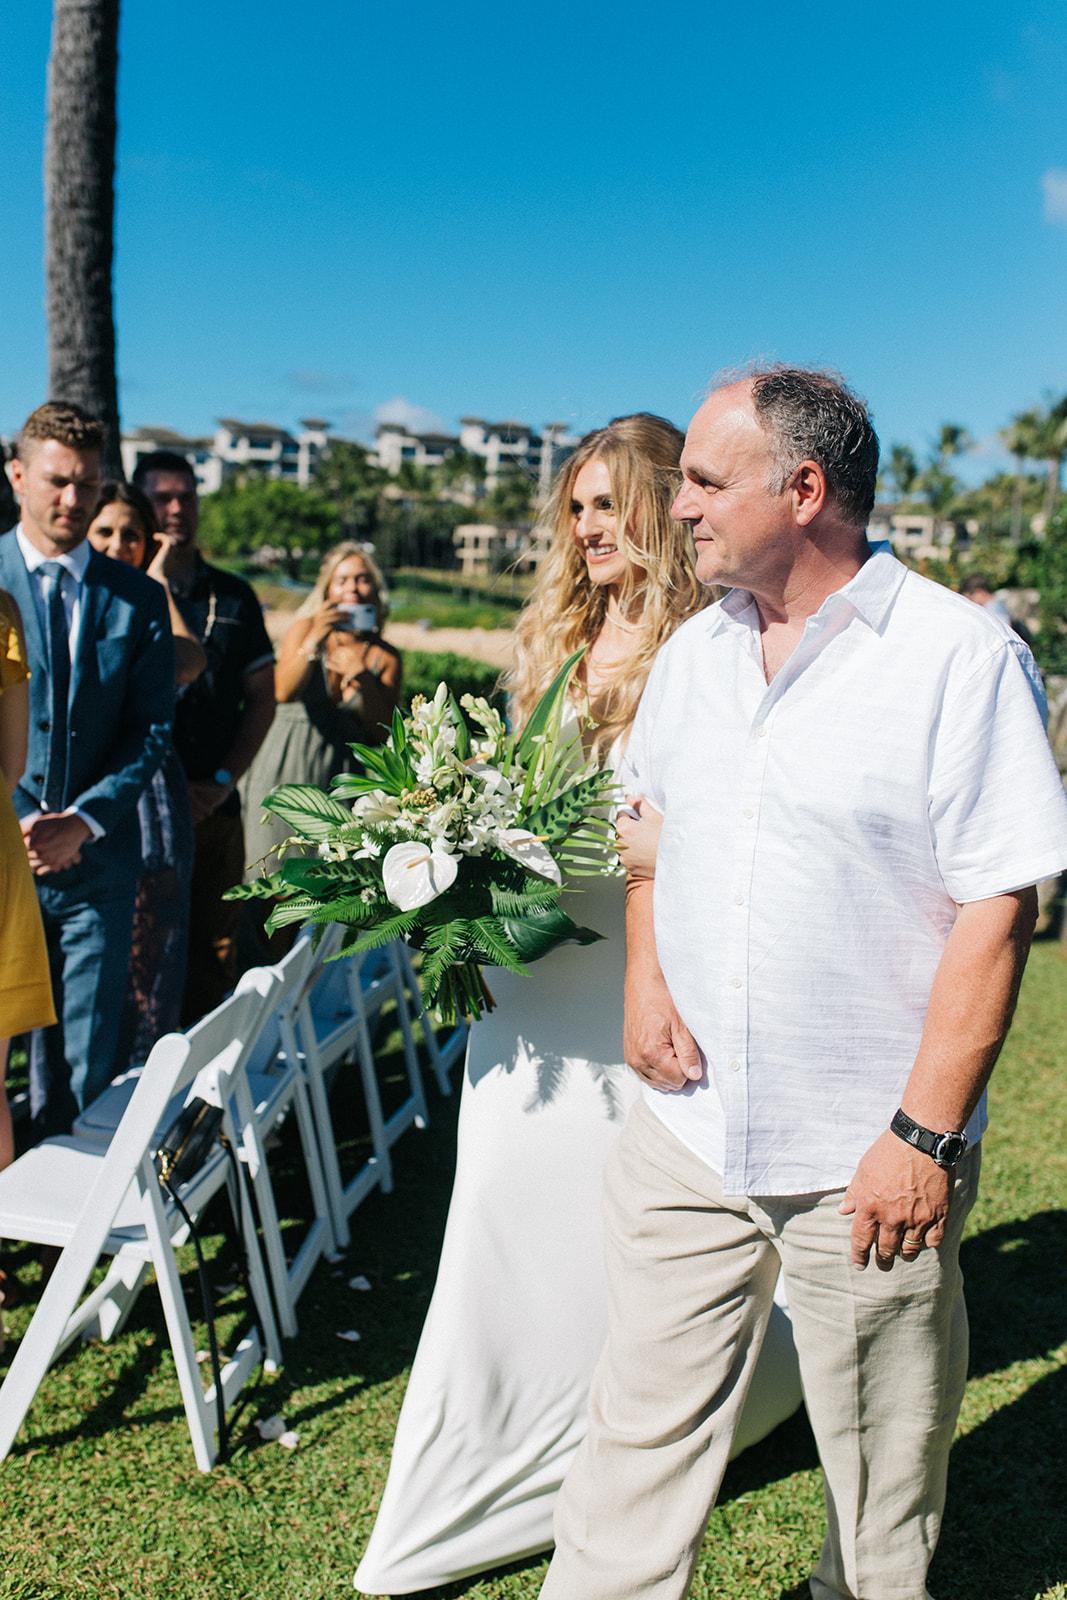 spokane bride and dad walking down the aisle